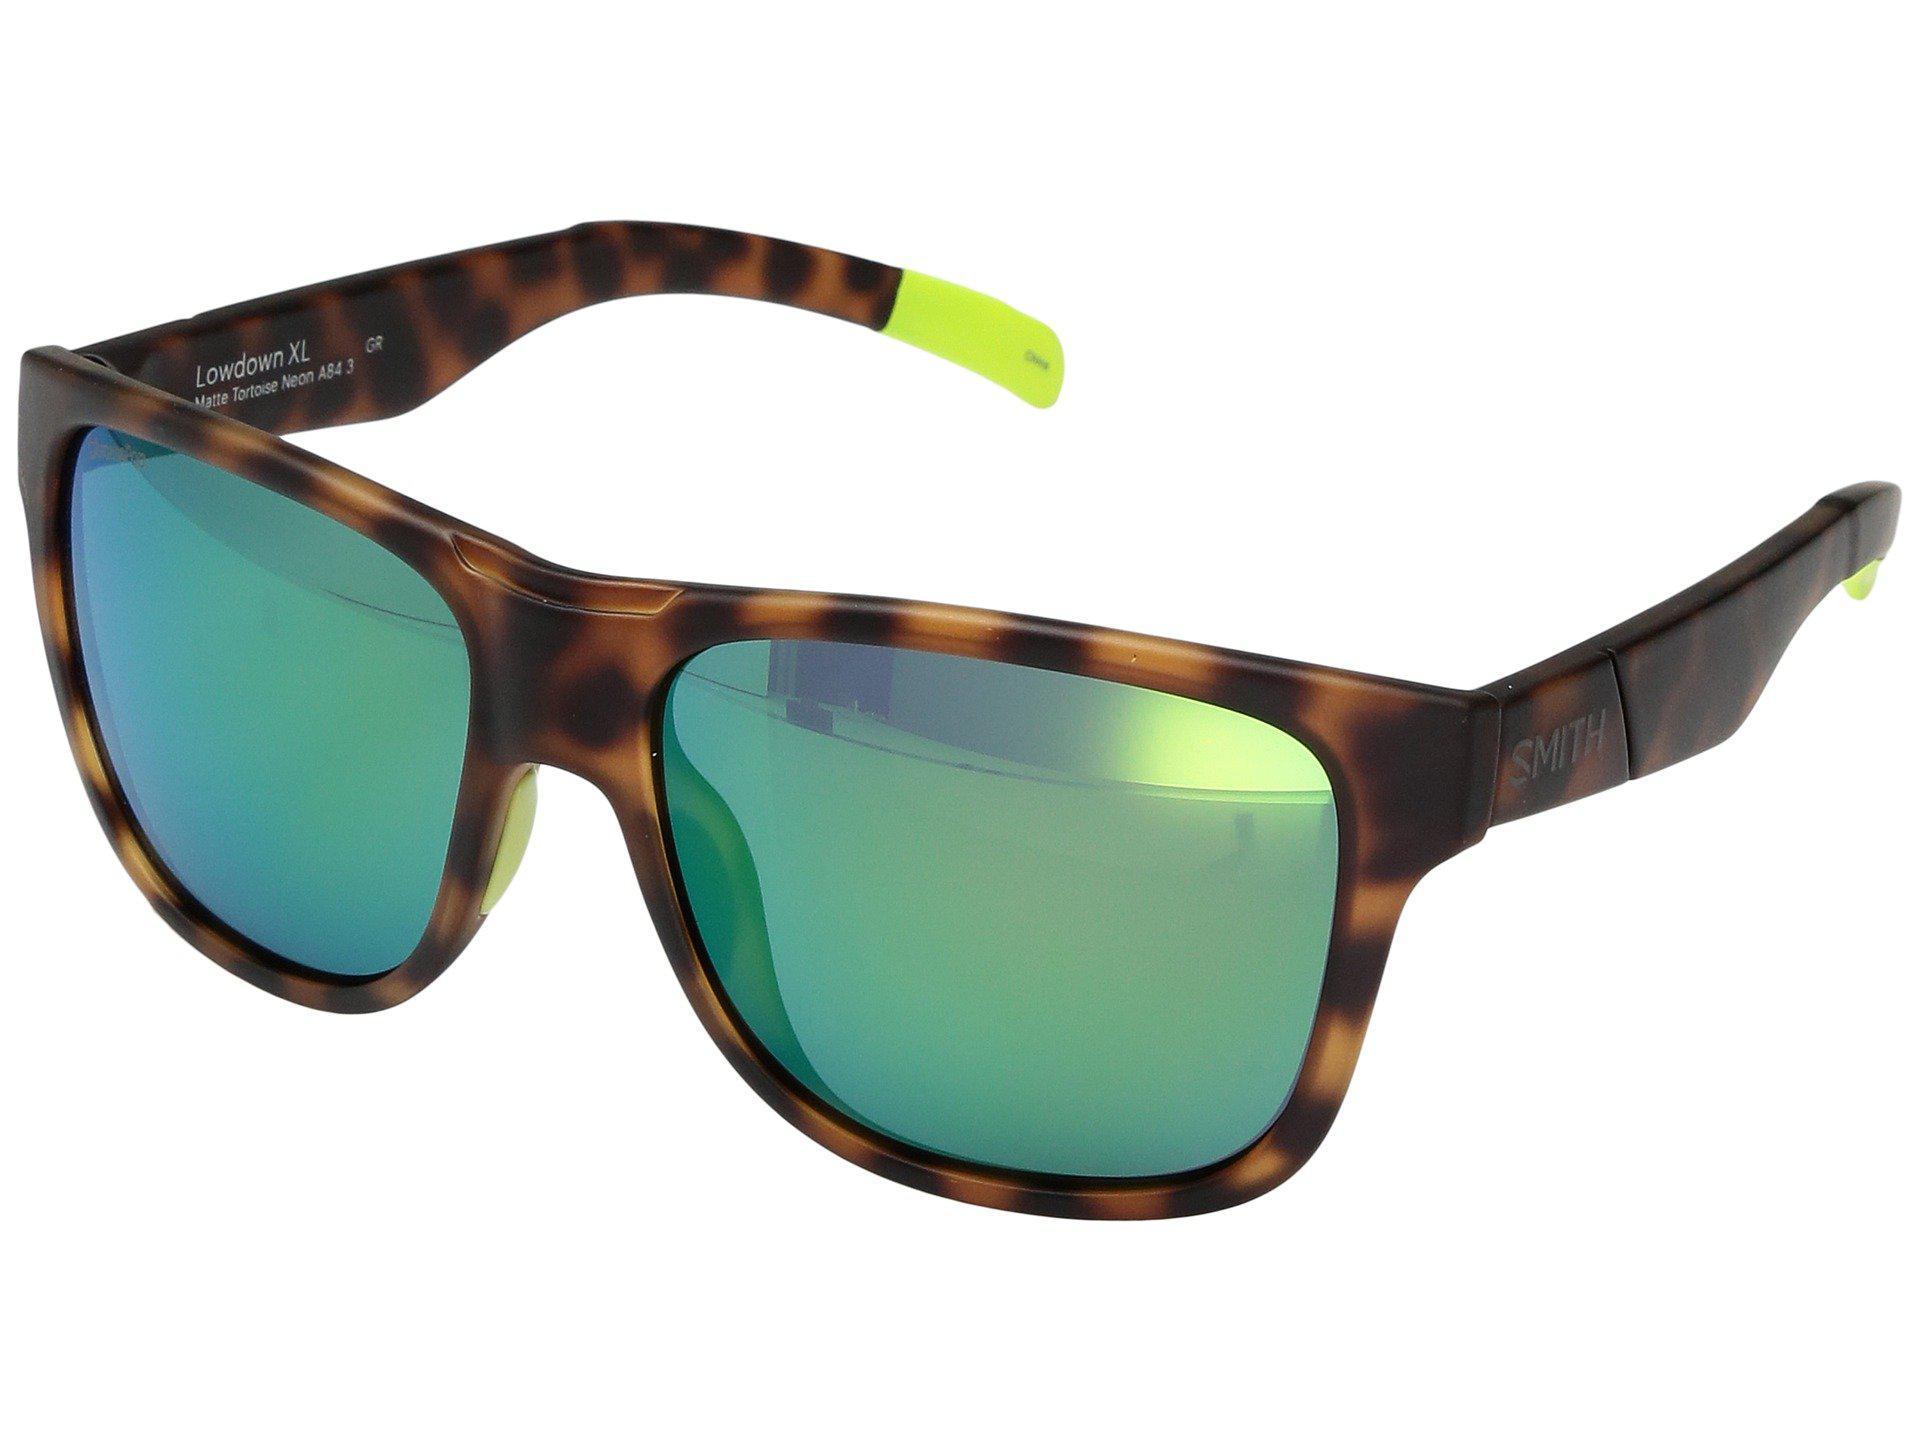 3217736e124 Smith Optics. Men s Lowdown Xl (matte Tortoise Neon chromapop Sun Green  Mirror Lens) Fashion Sunglasses